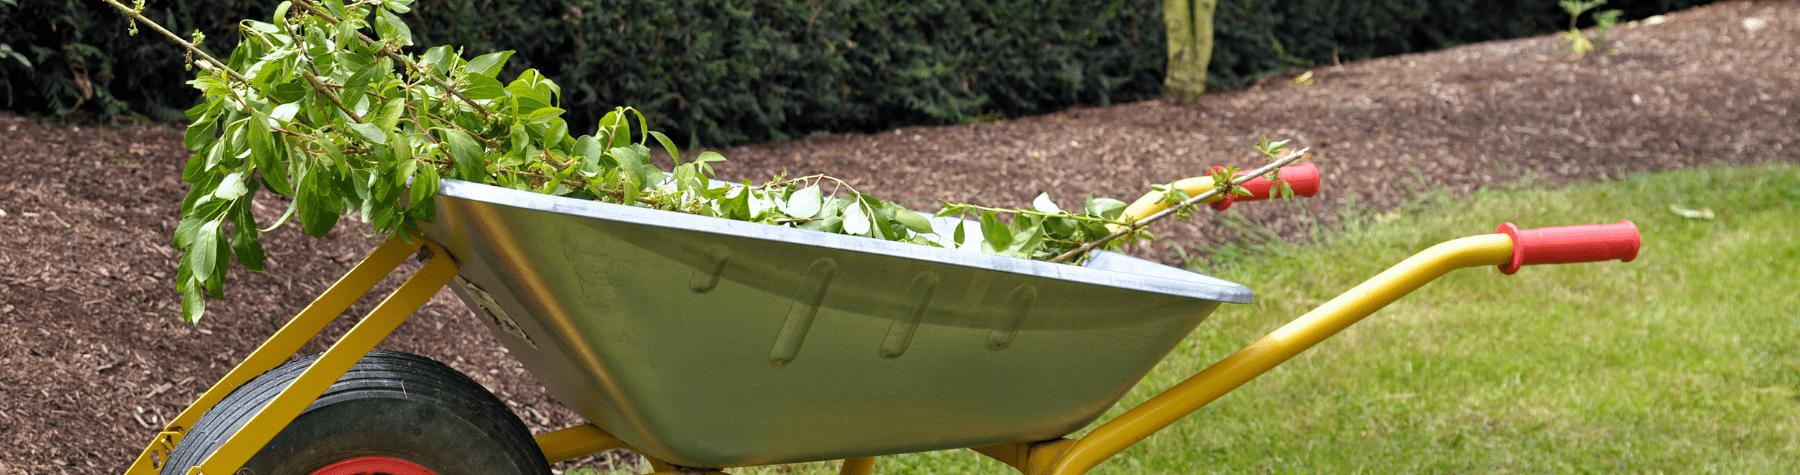 Free Green Waste Disposal